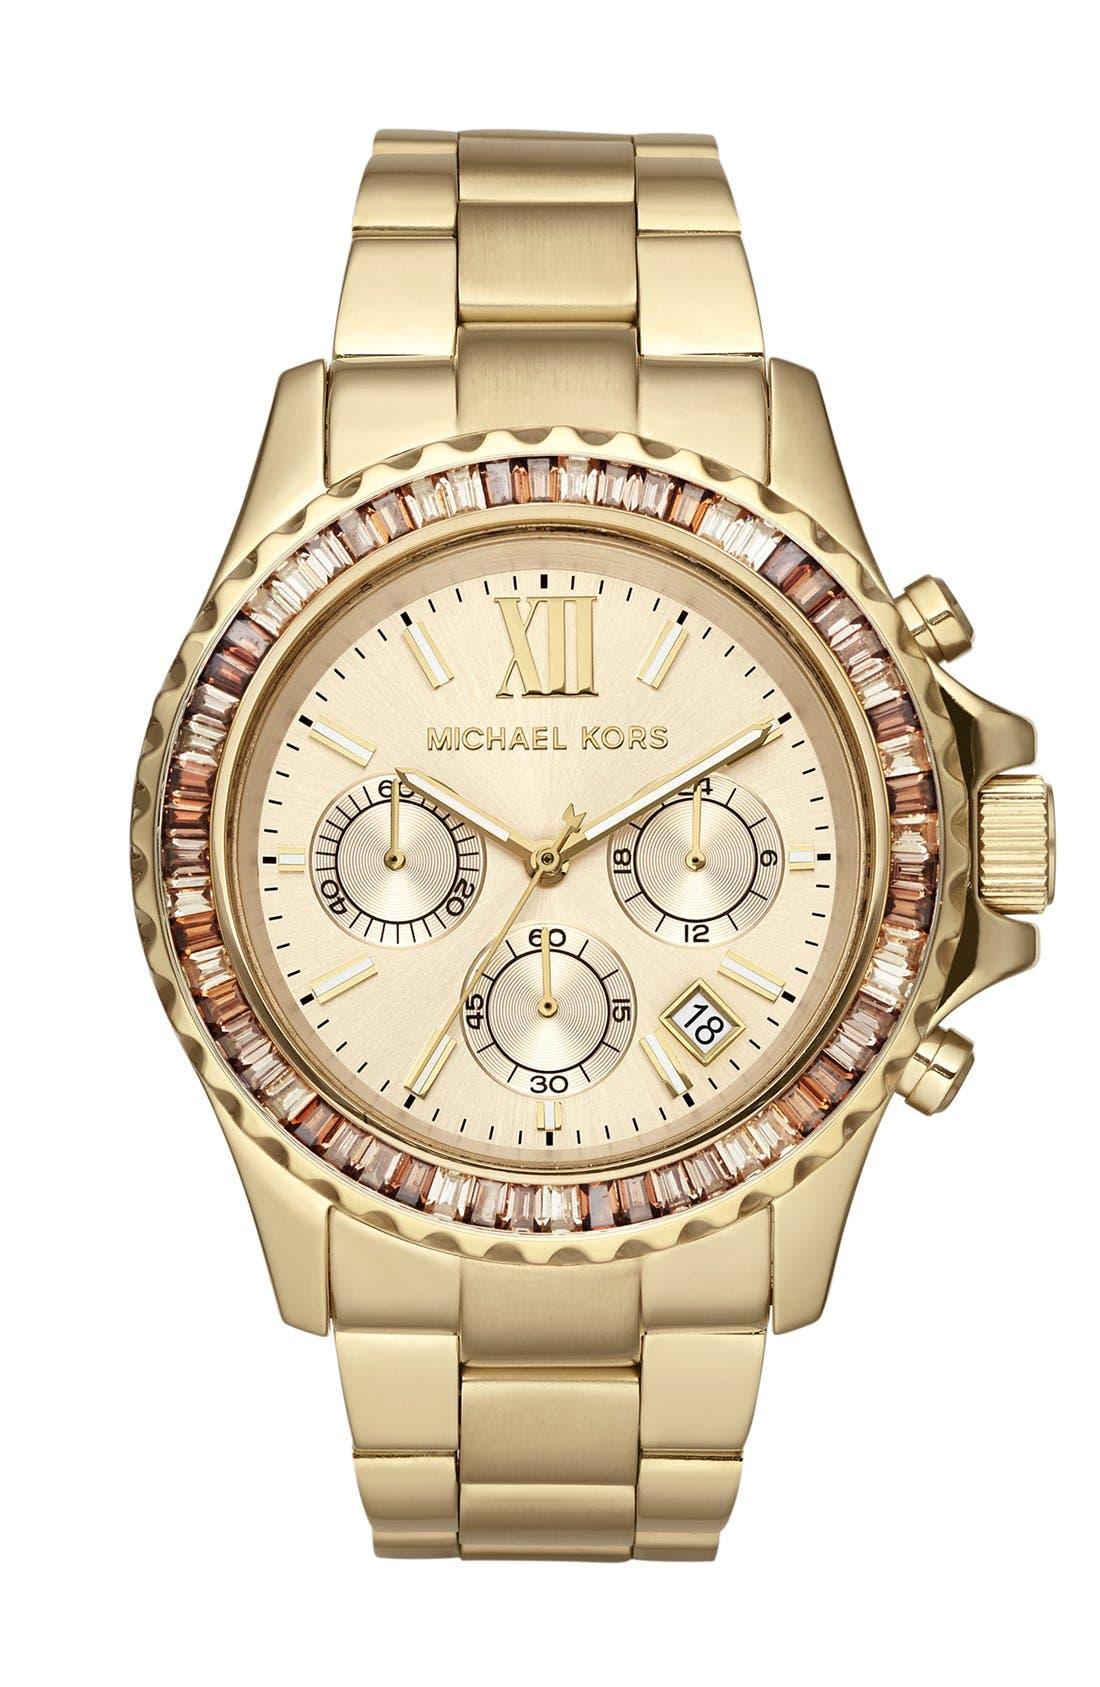 Main Image - Michael Kors 'Everest' Baguette Crystal Bezel Bracelet Watch, 41mm